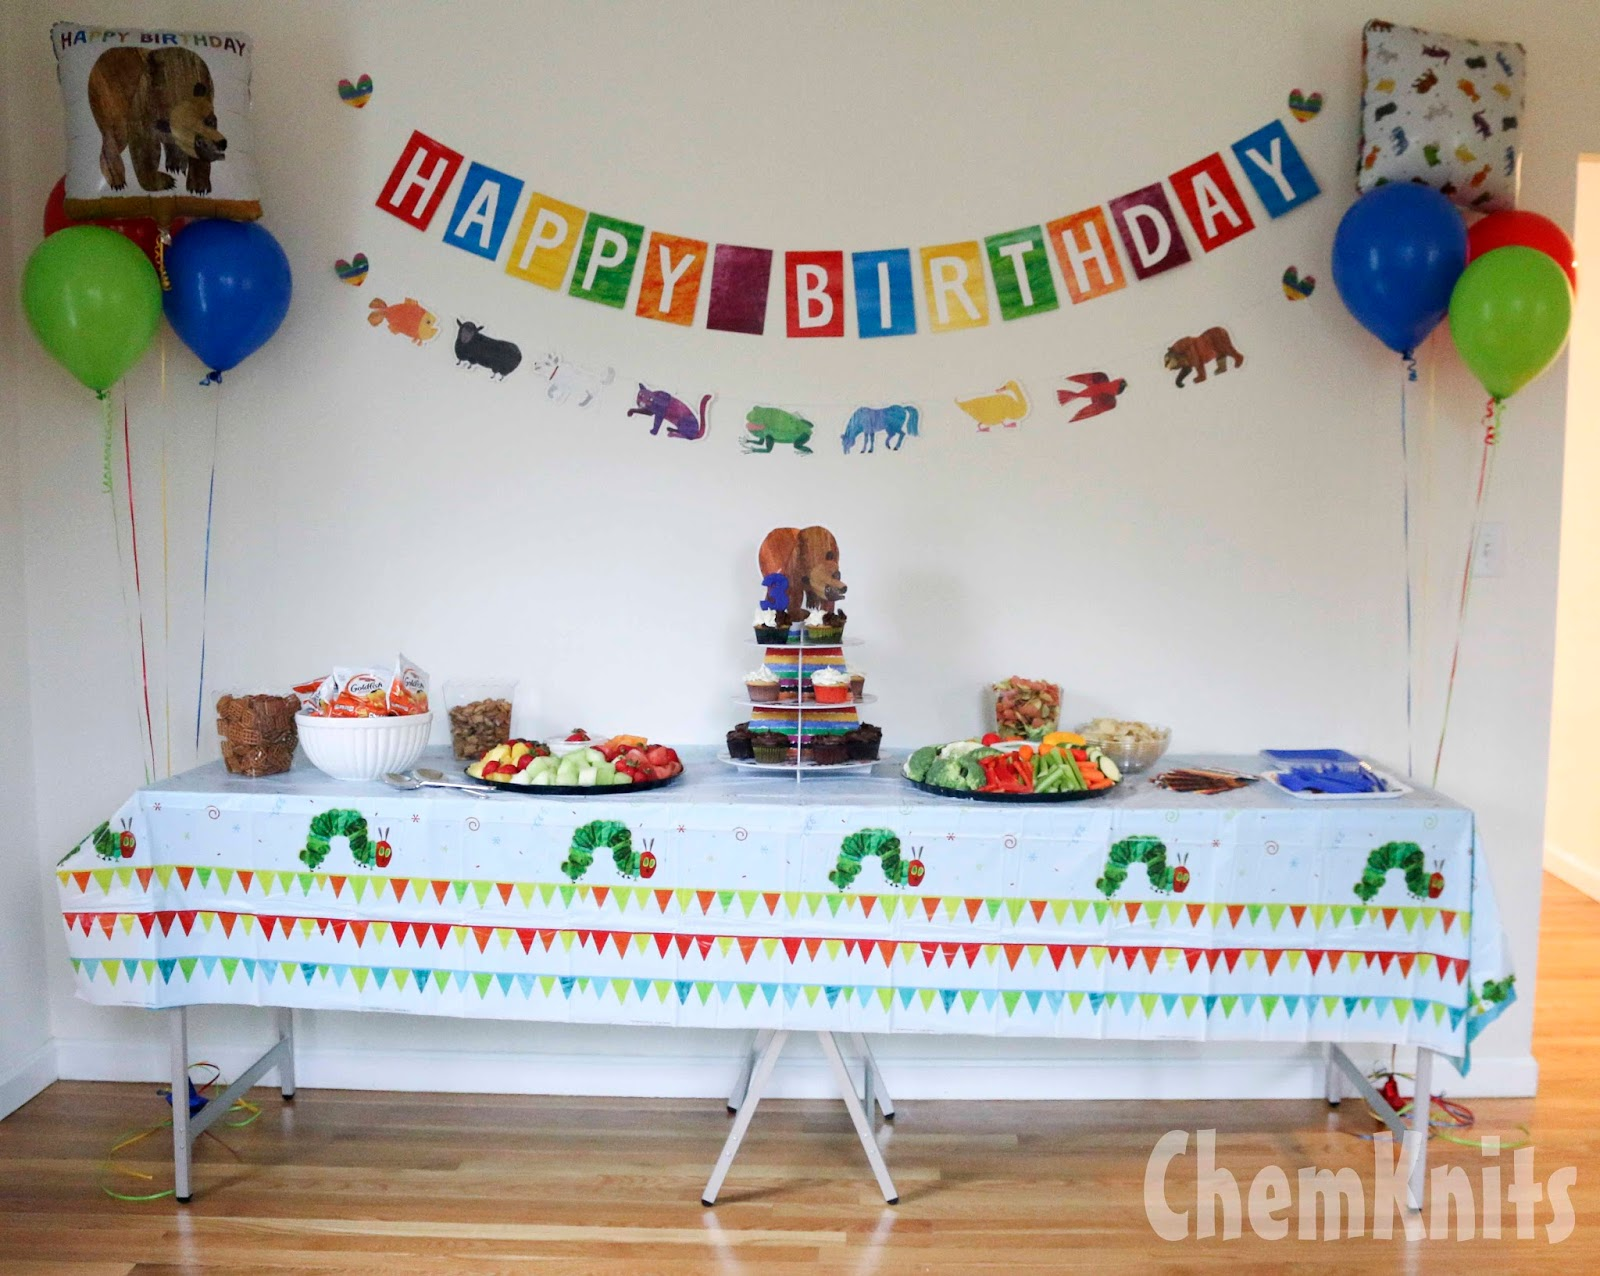 Chemknits An Eric Carle Brown Bear Brown Bear Birthday Party